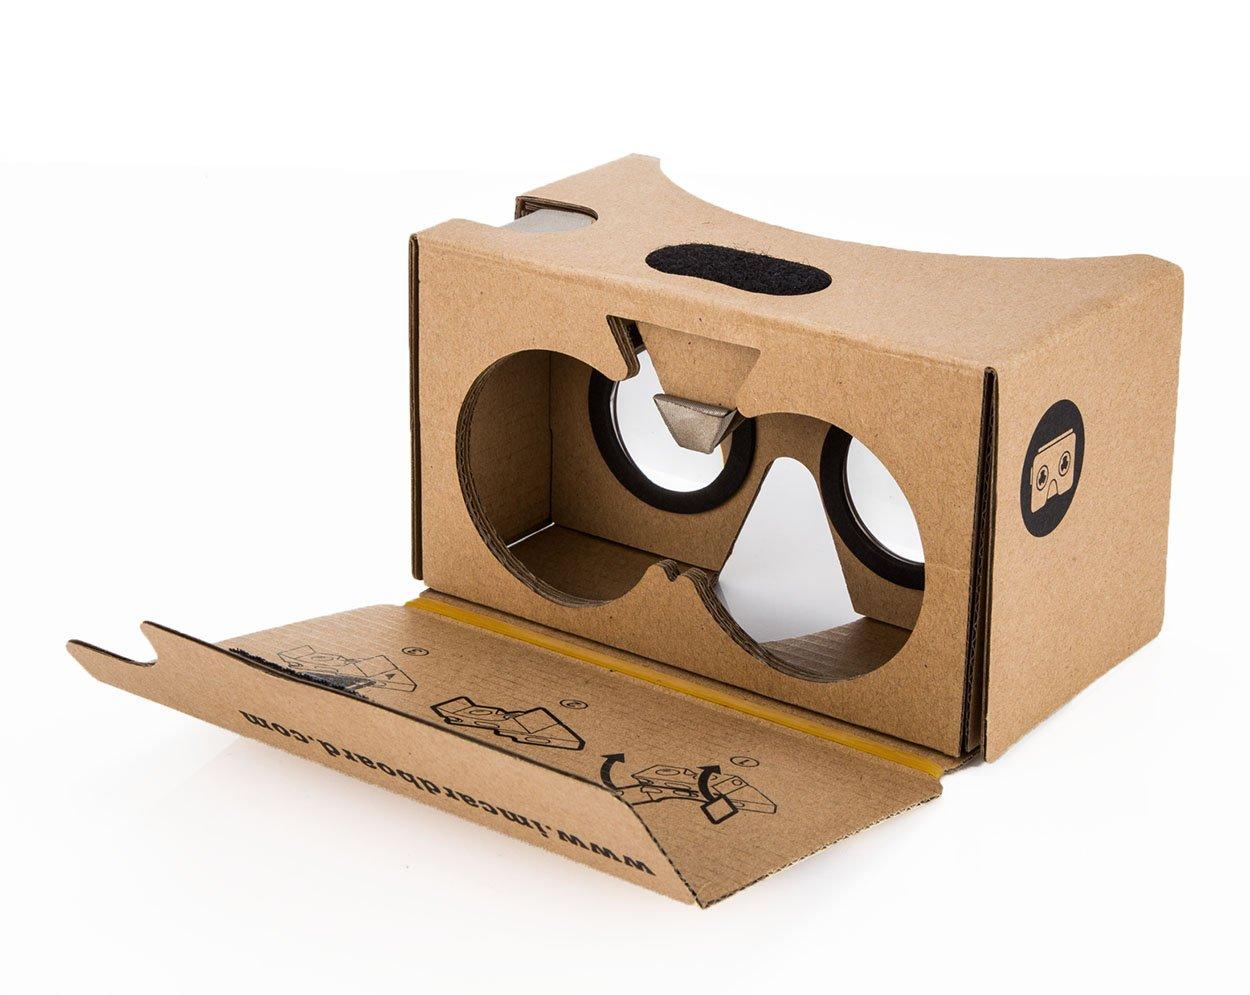 amazon com i am cardboard vr cardboard kit v2 cell phones